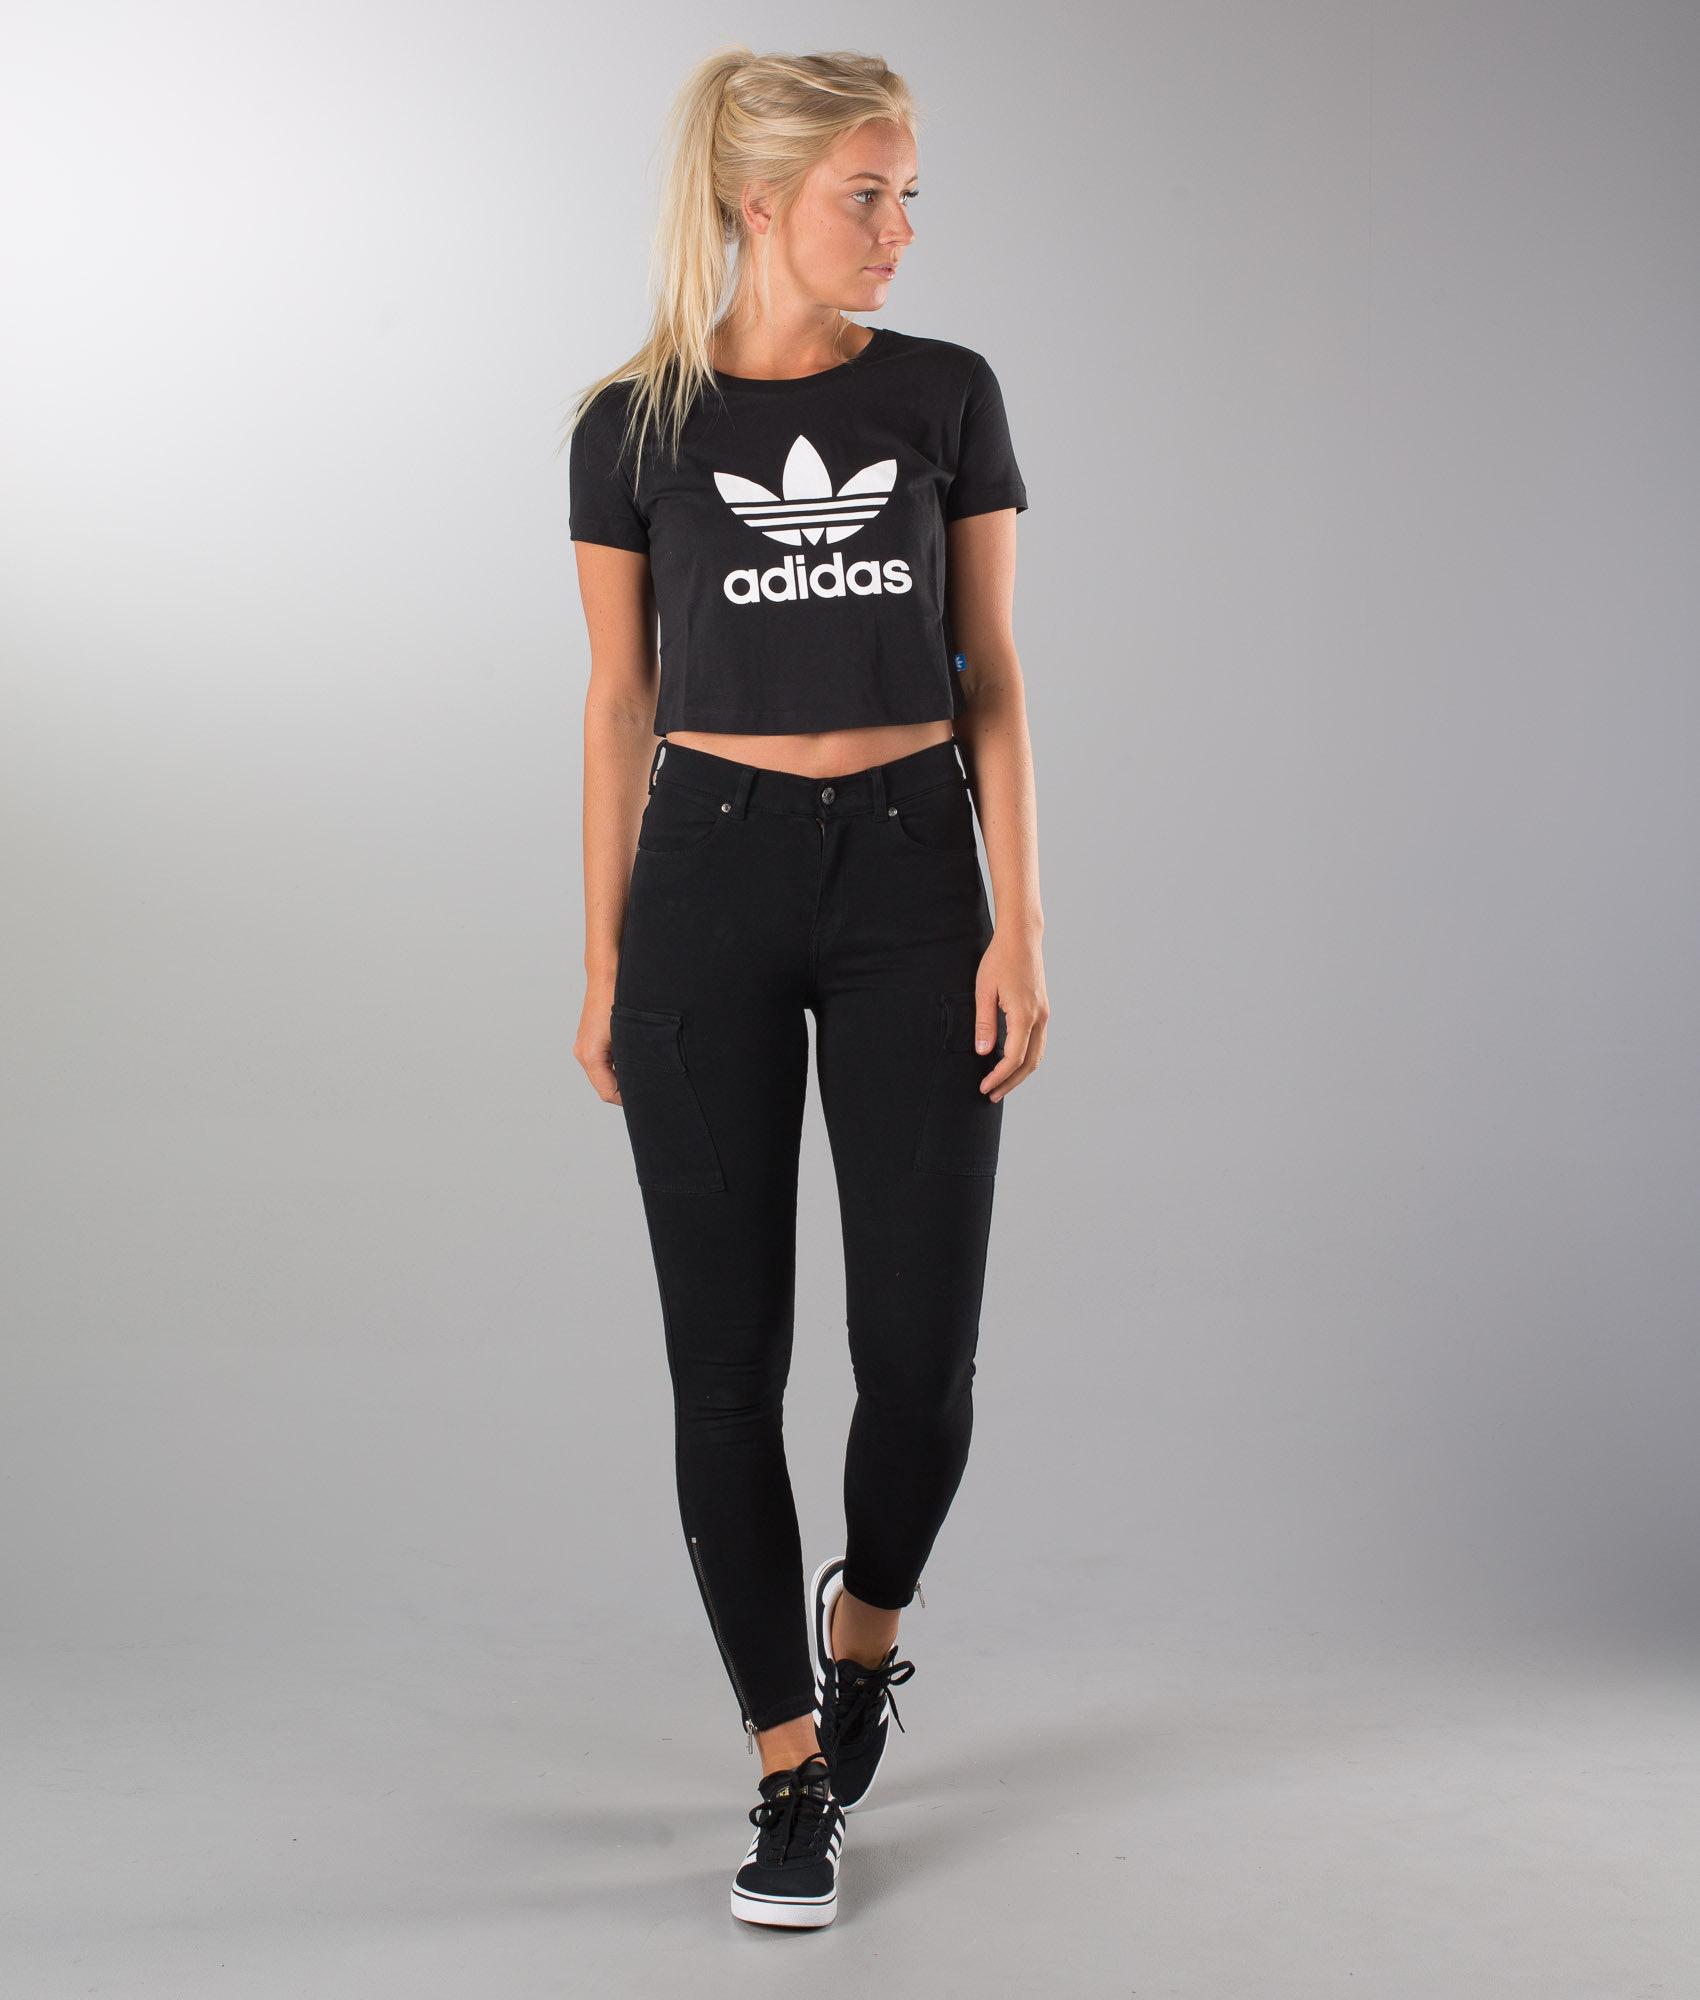 80281cc76c67 Adidas Originals Slim Crop T-shirt Black - Ridestore.com